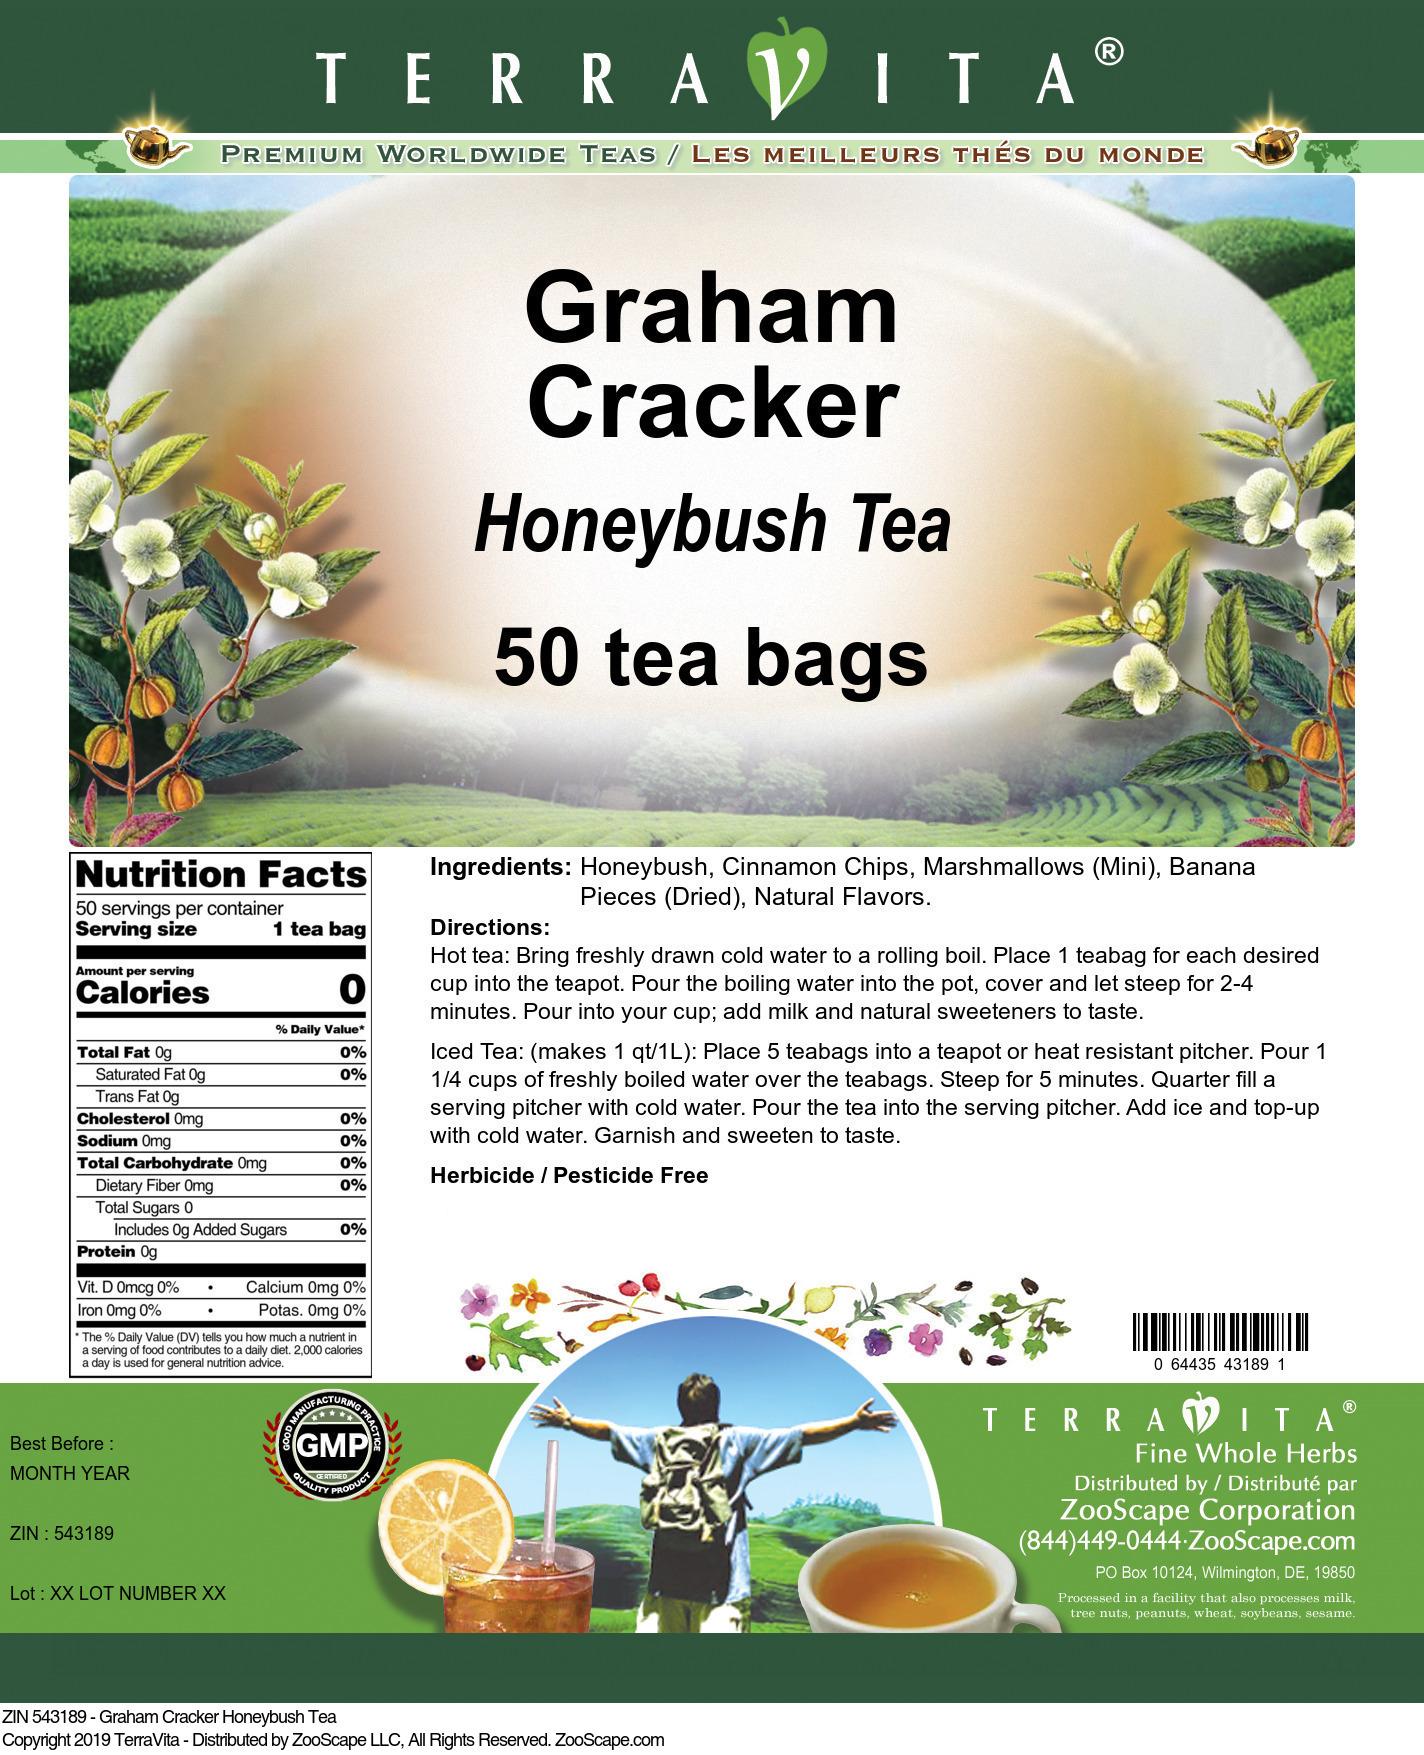 Graham Cracker Honeybush Tea